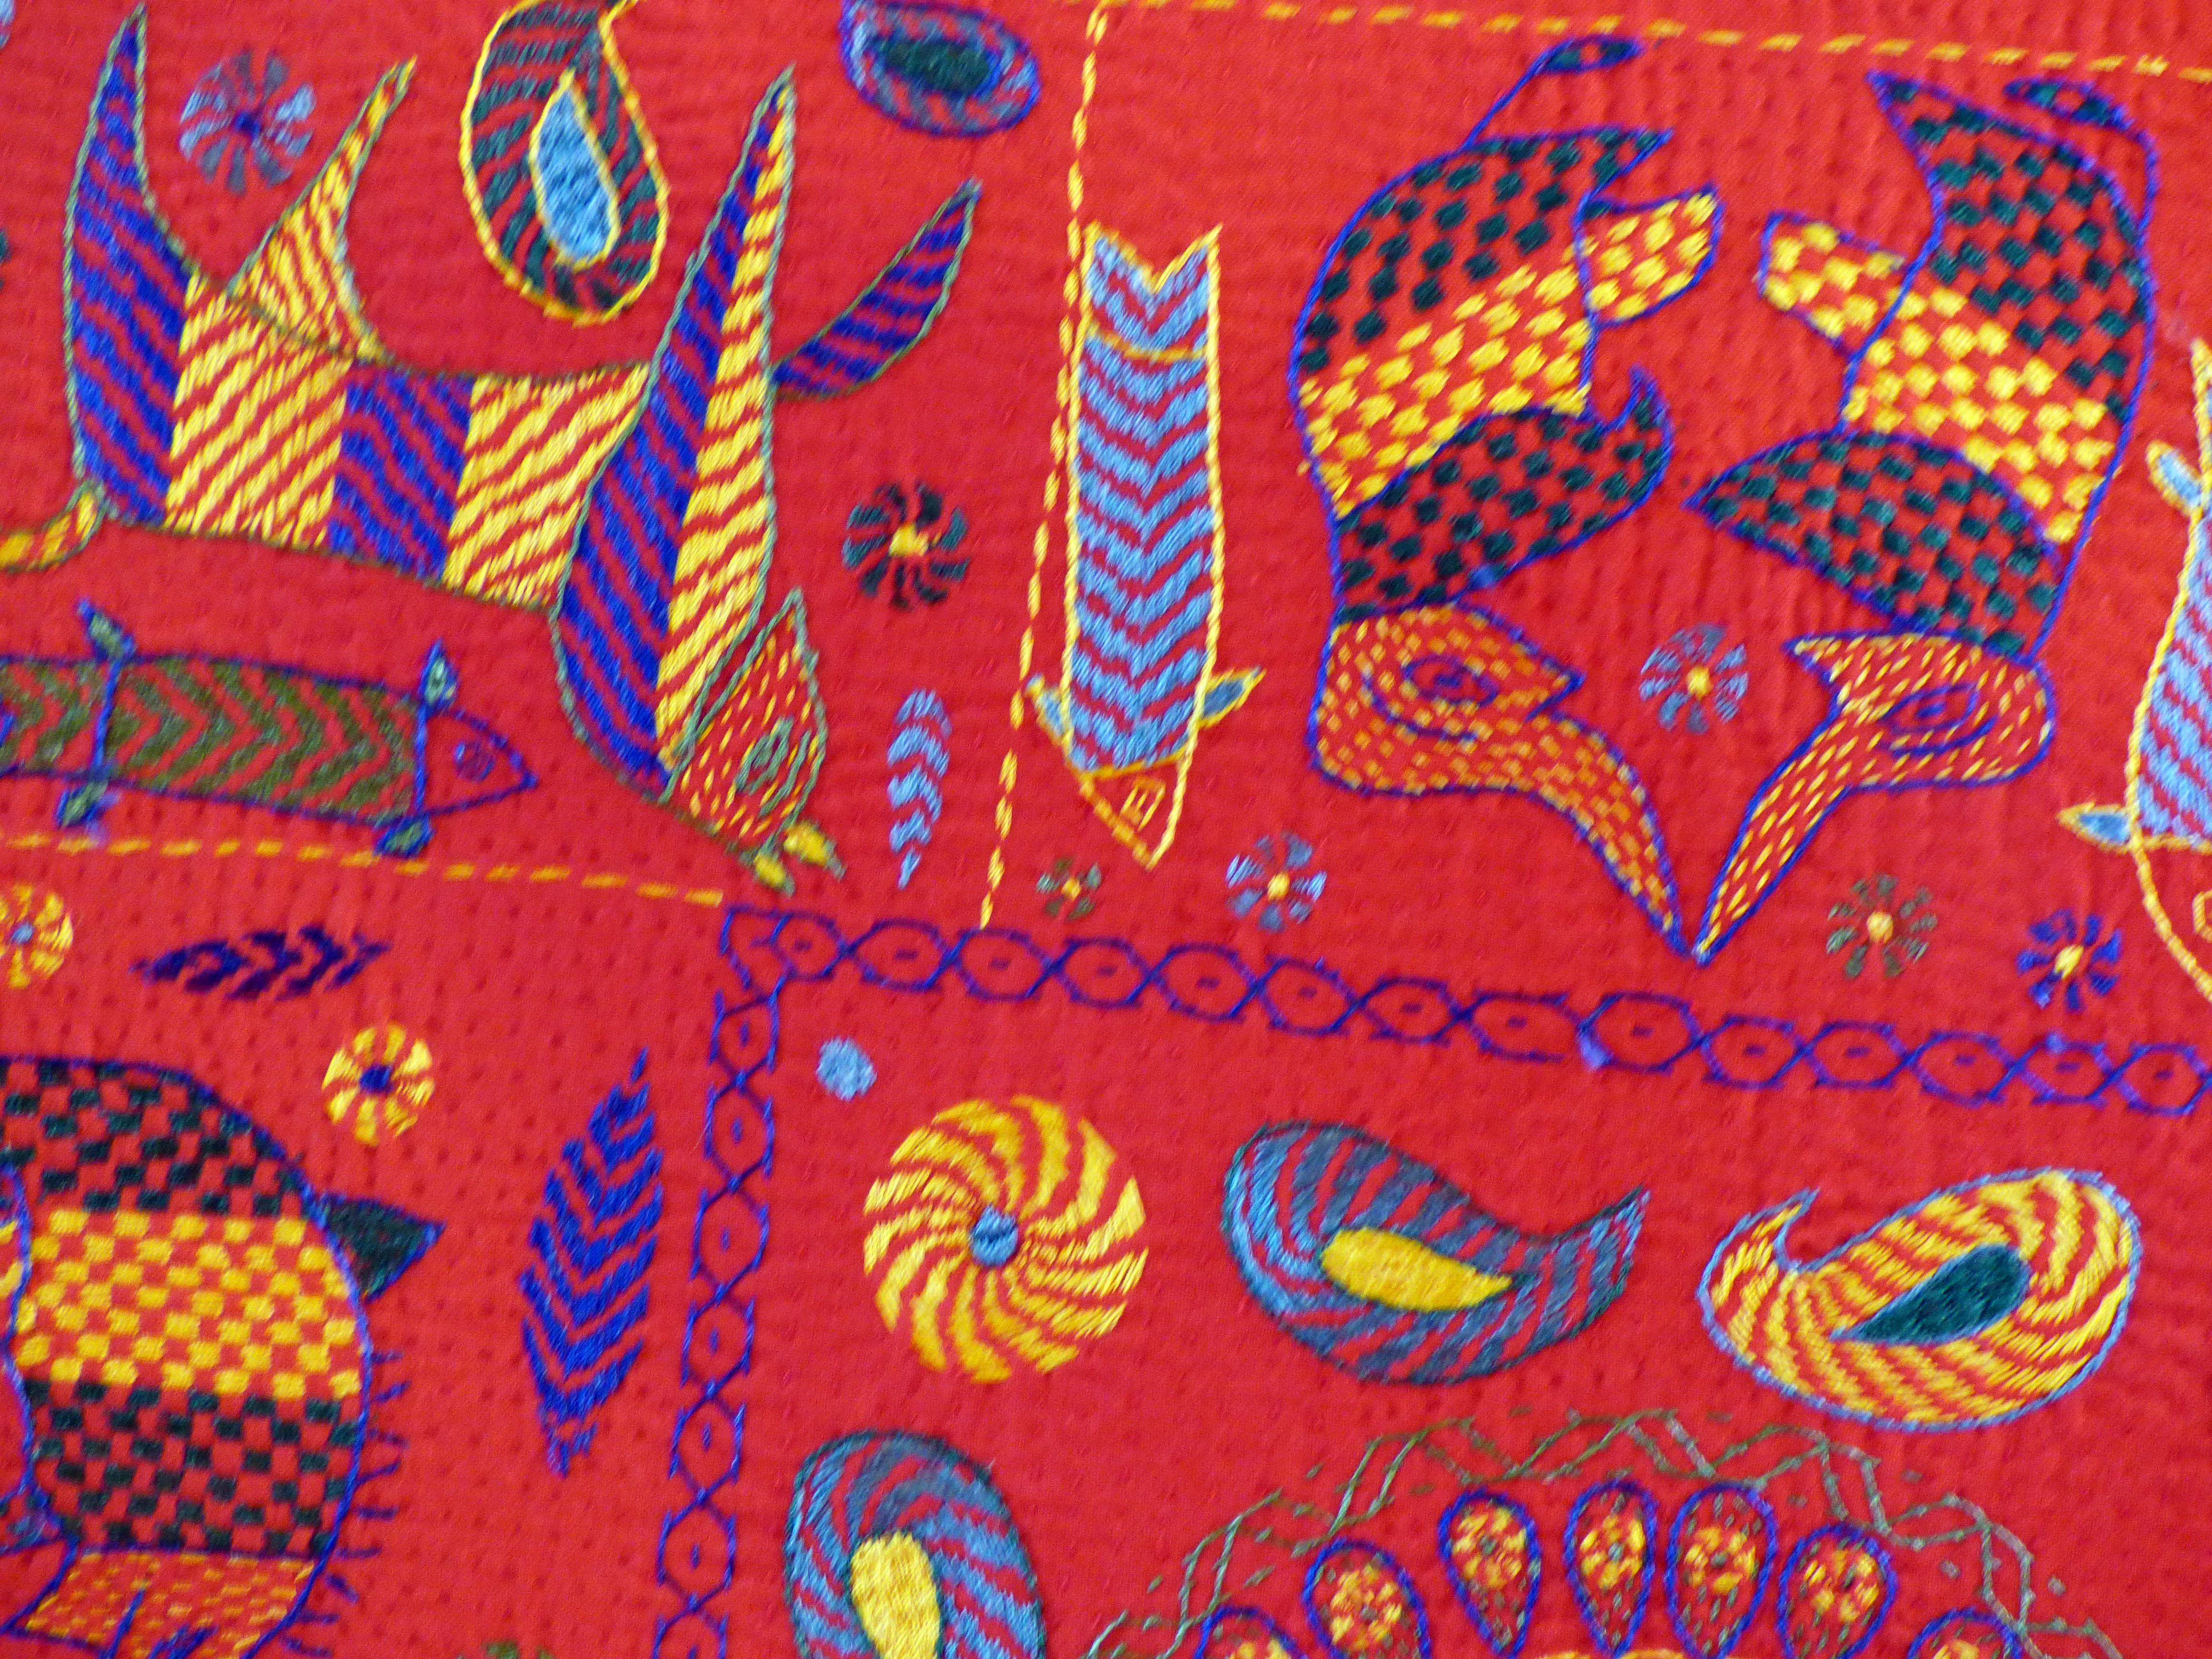 detail of kantha embroidery by women of Bangladesh at Threading Dreams exhibition at St Barnabus, April 2016